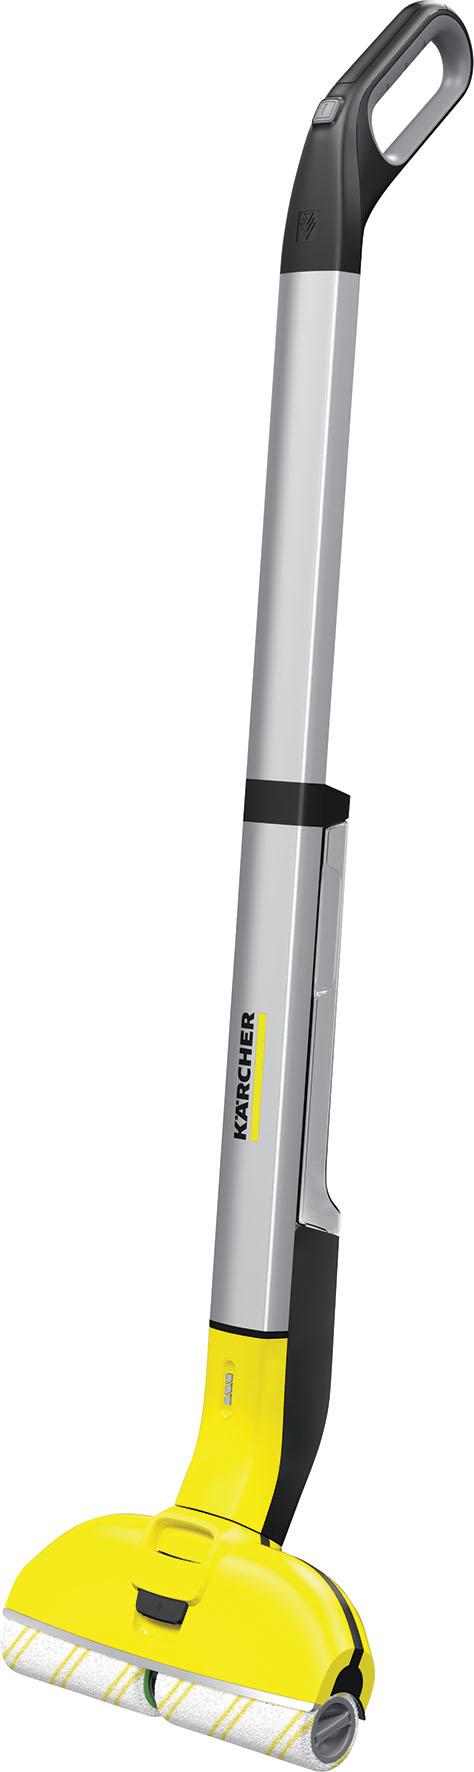 lavasciuga-karcher-fc3-cordles